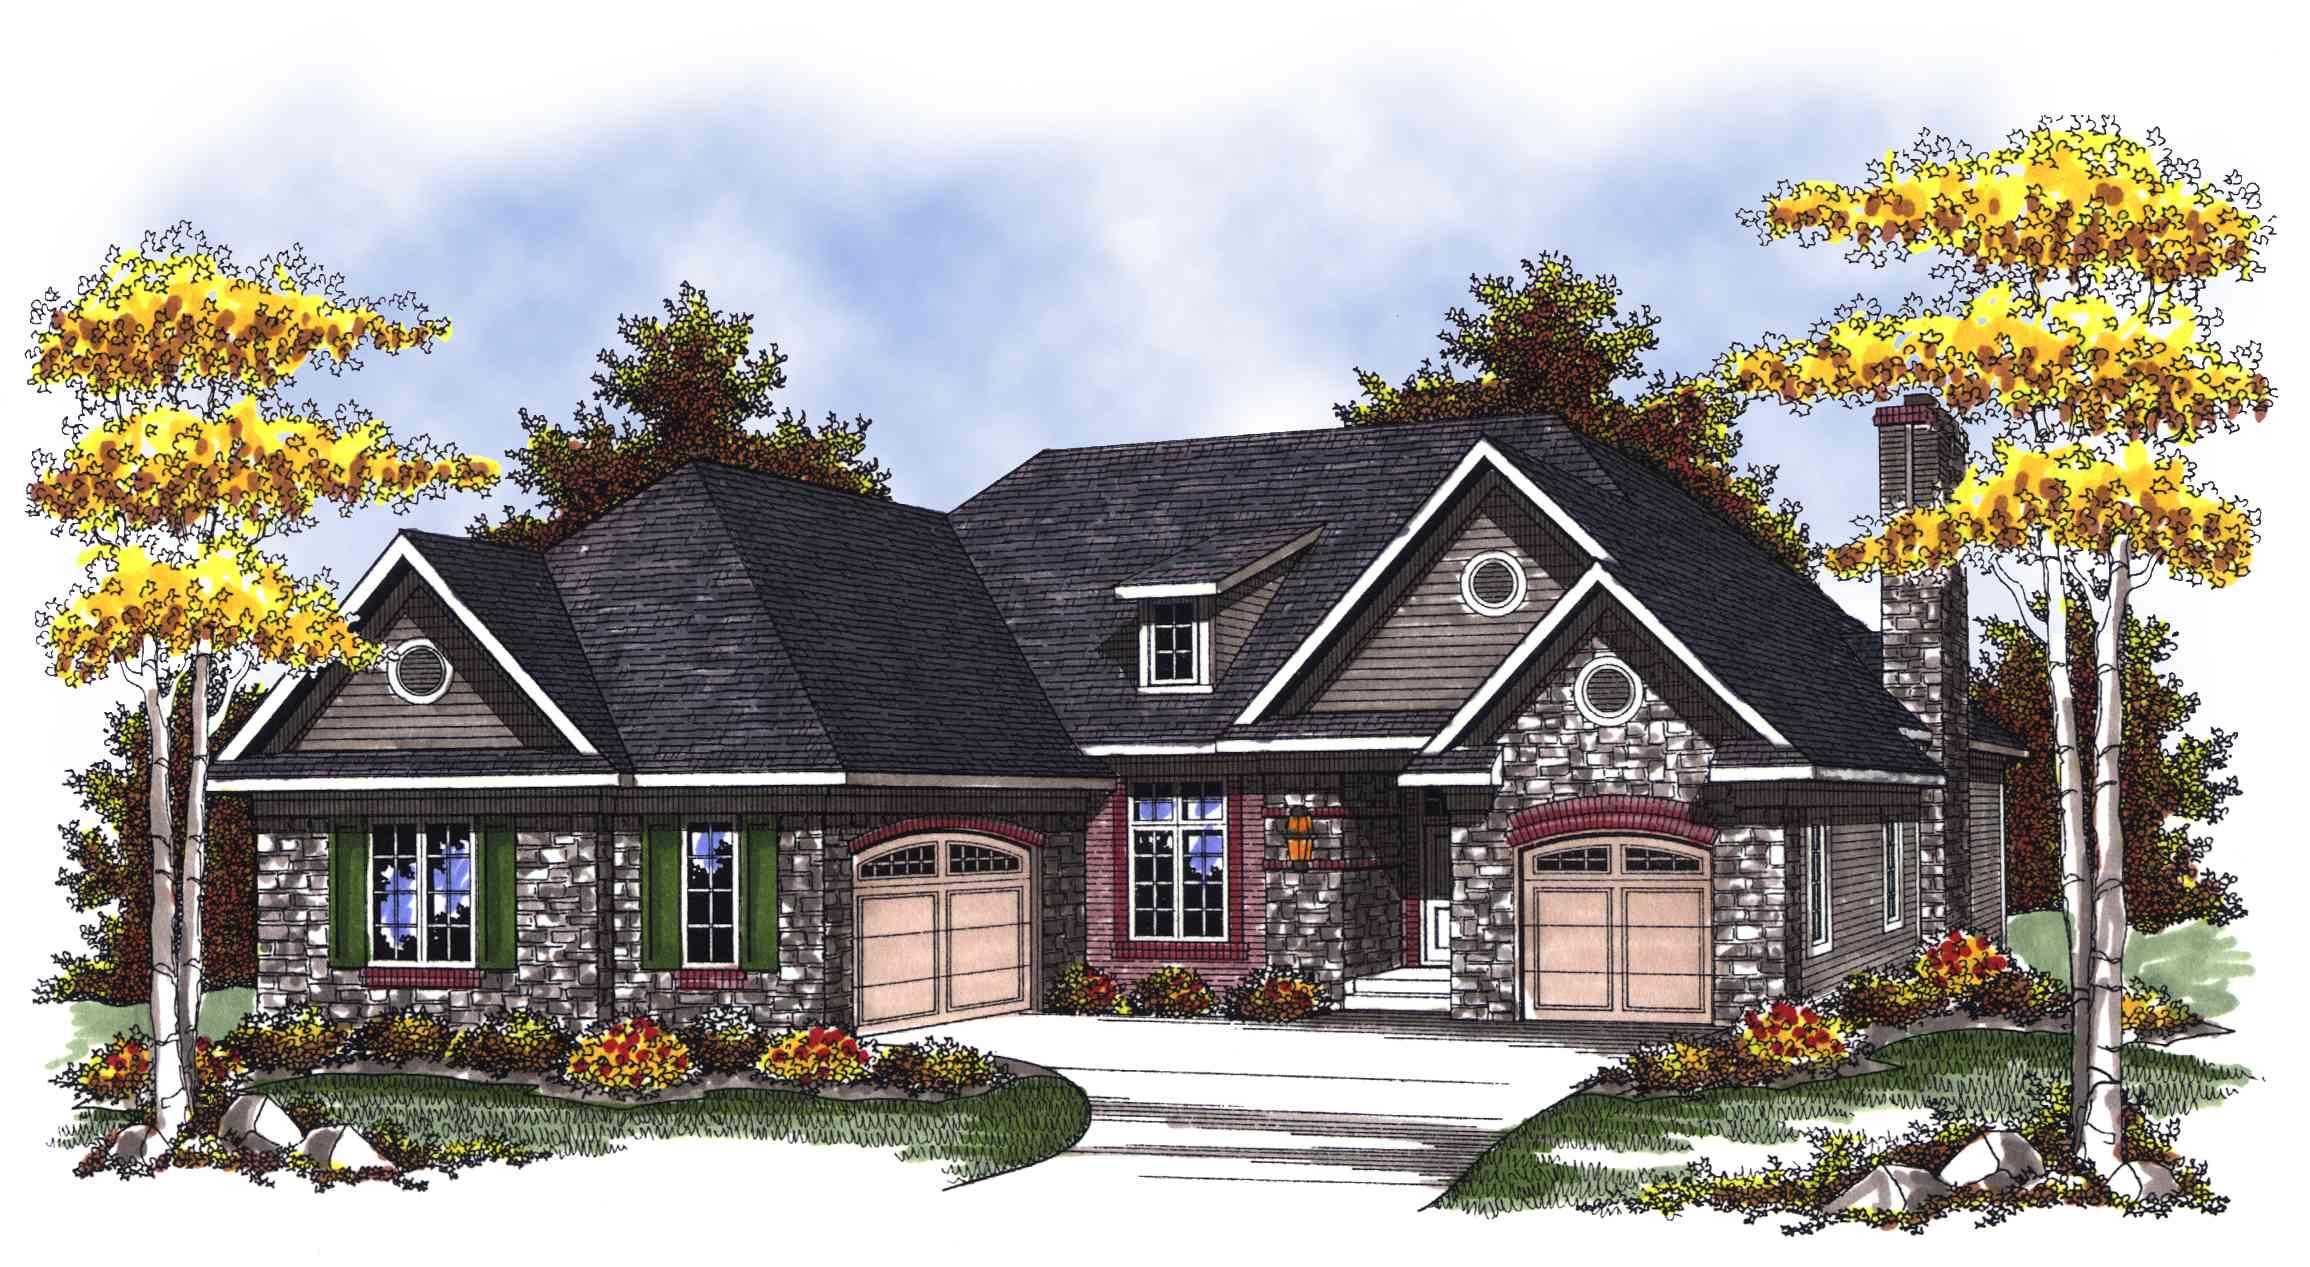 Split Ranch Home Plan with 3 Car Garage